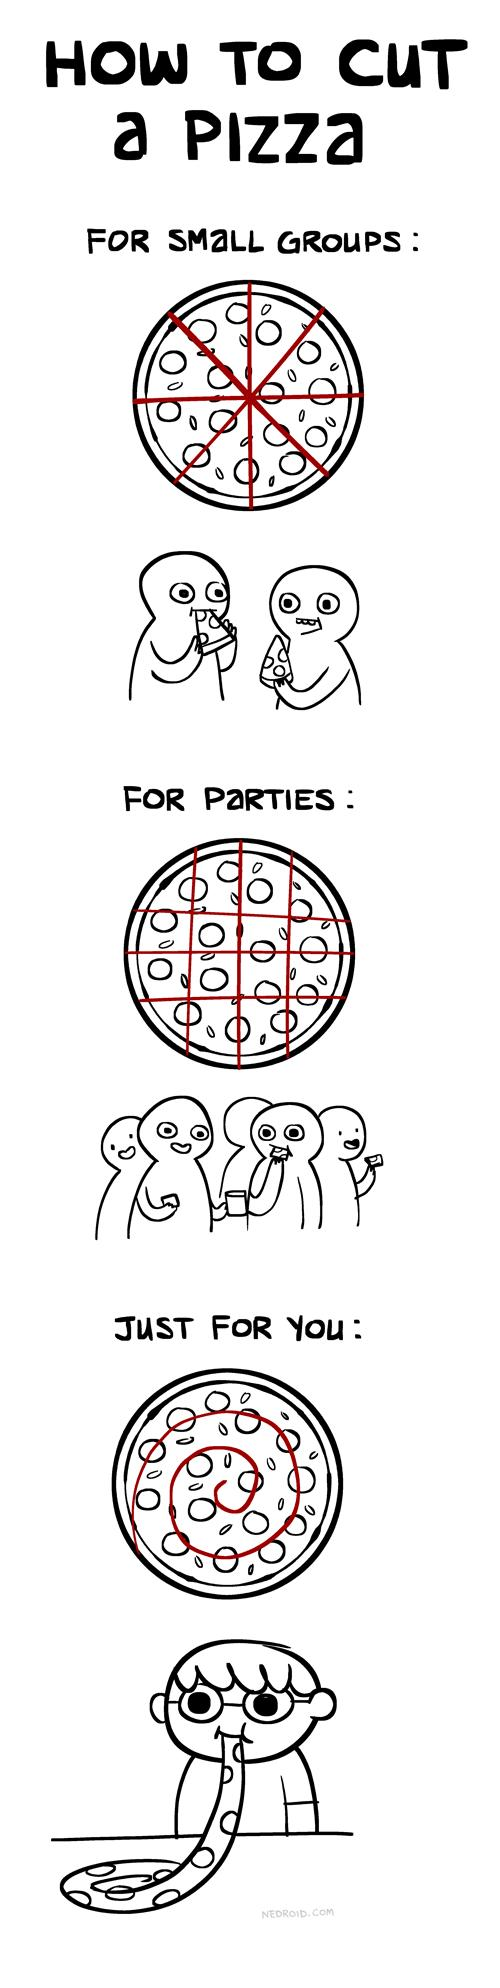 Jak jeść pizzę?